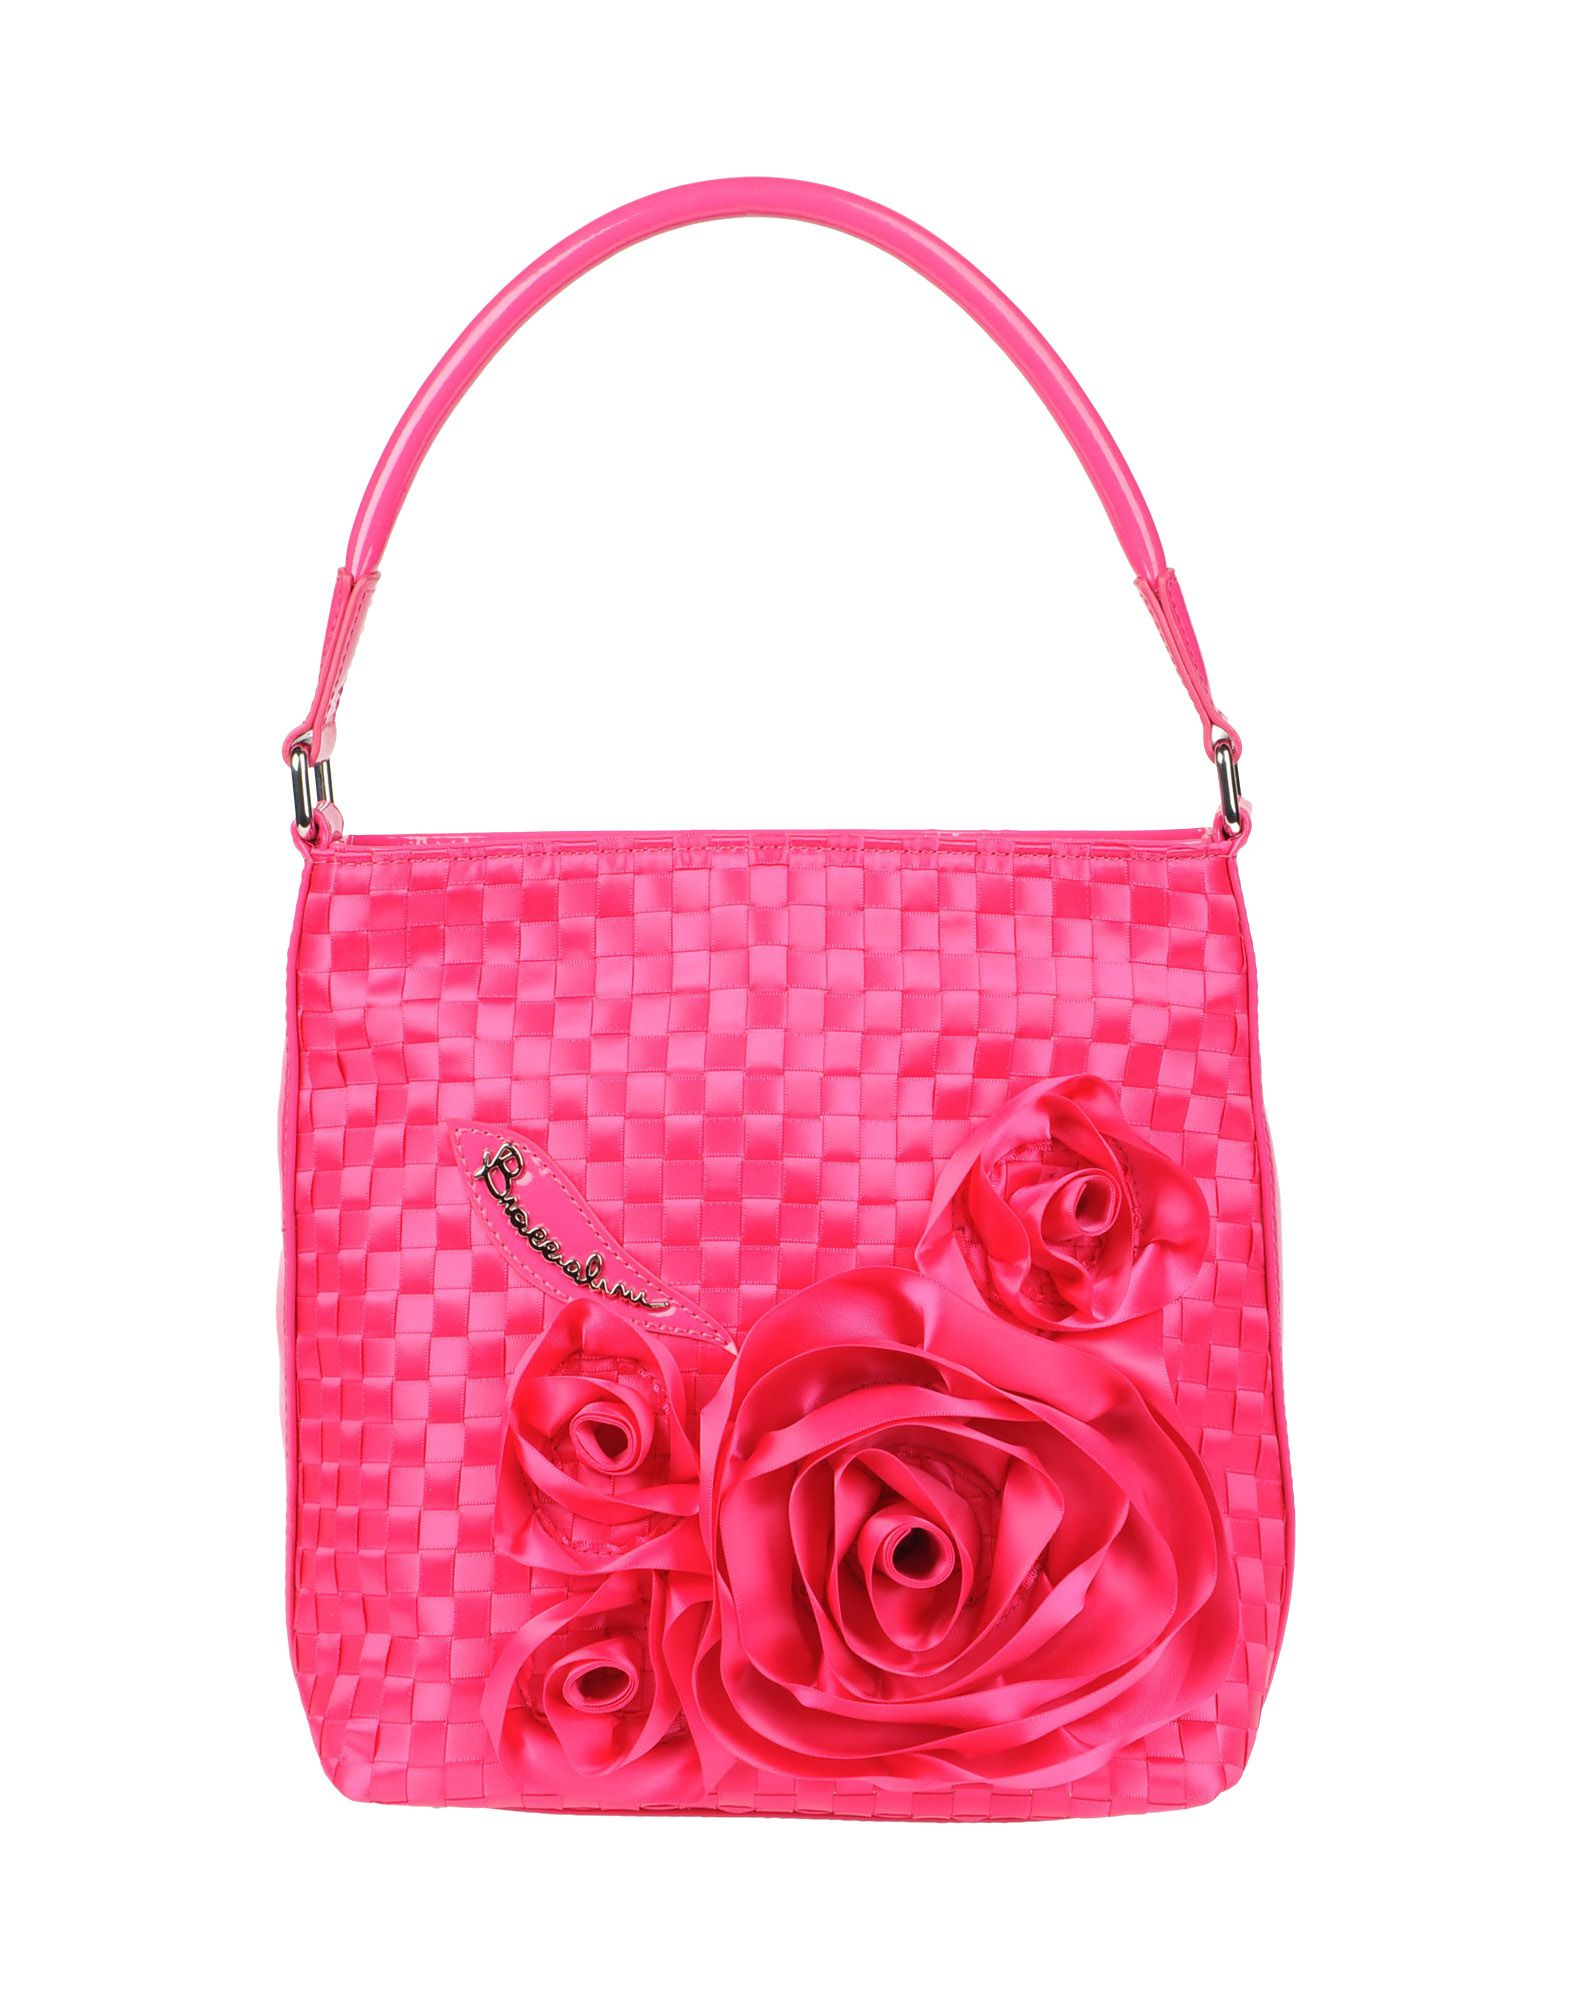 BRACCIALINI Средняя сумка из текстиля braccialini сумка на плечо